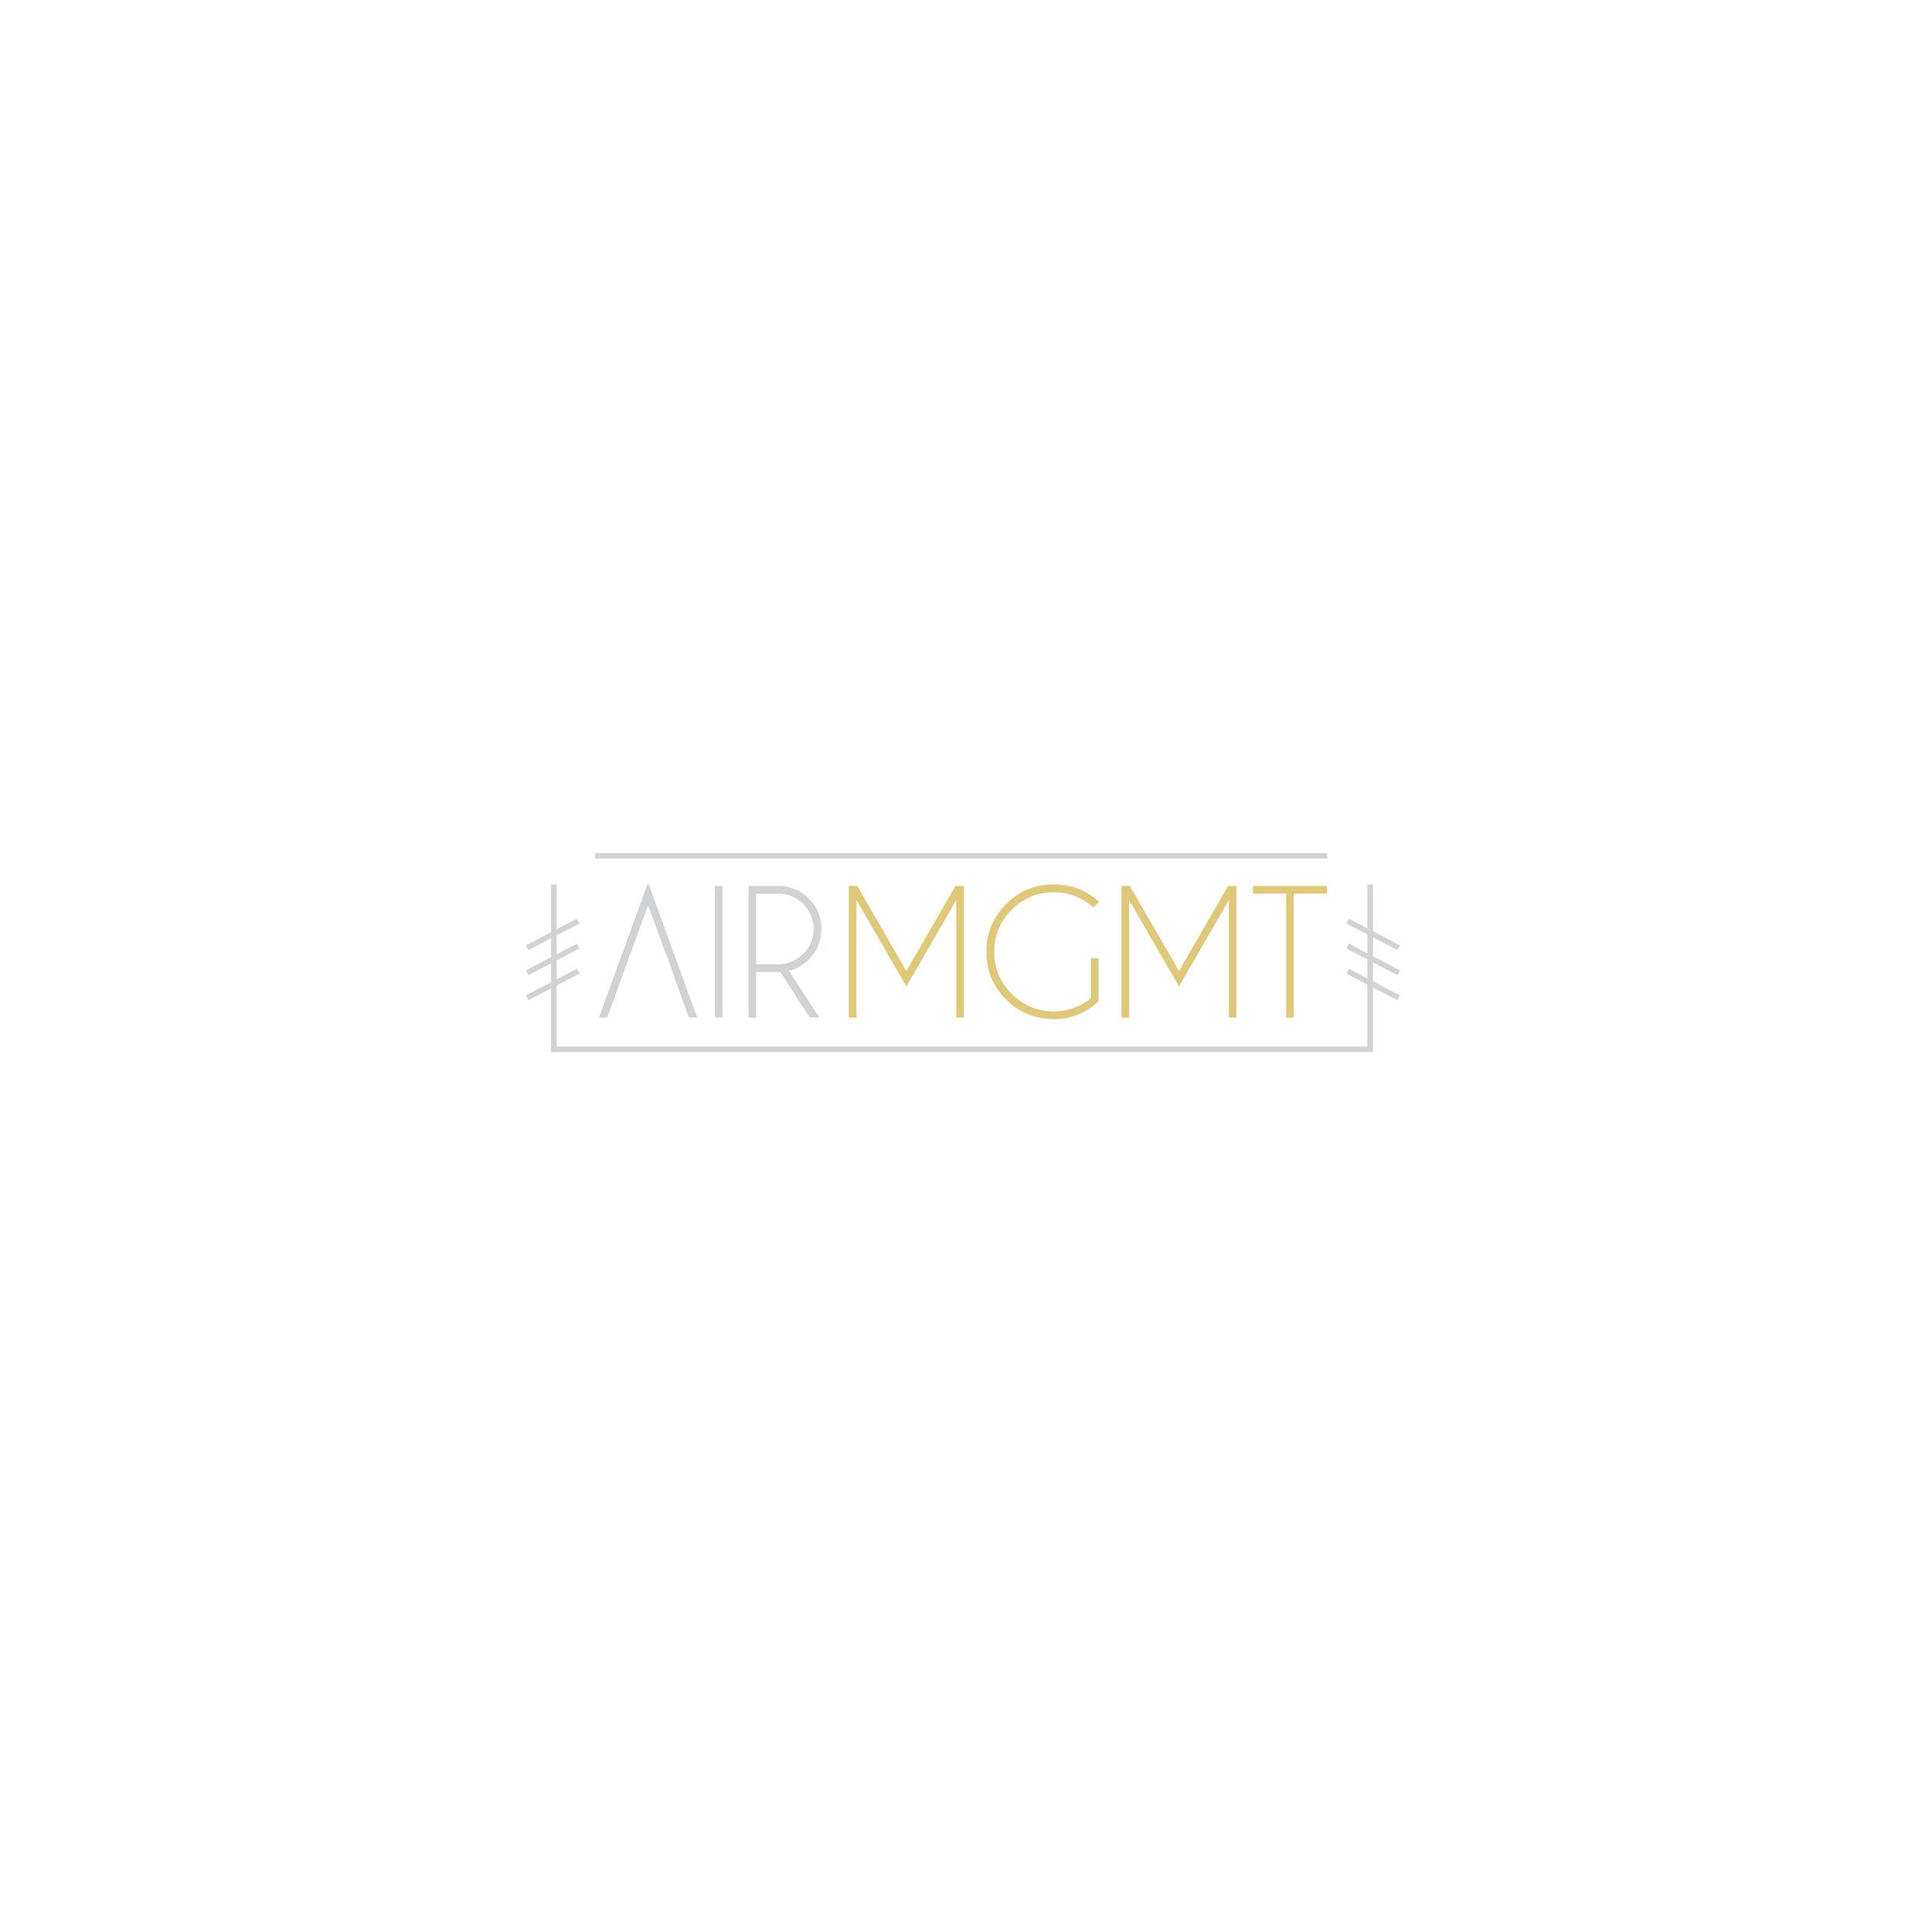 AIRMGMT4.jpg